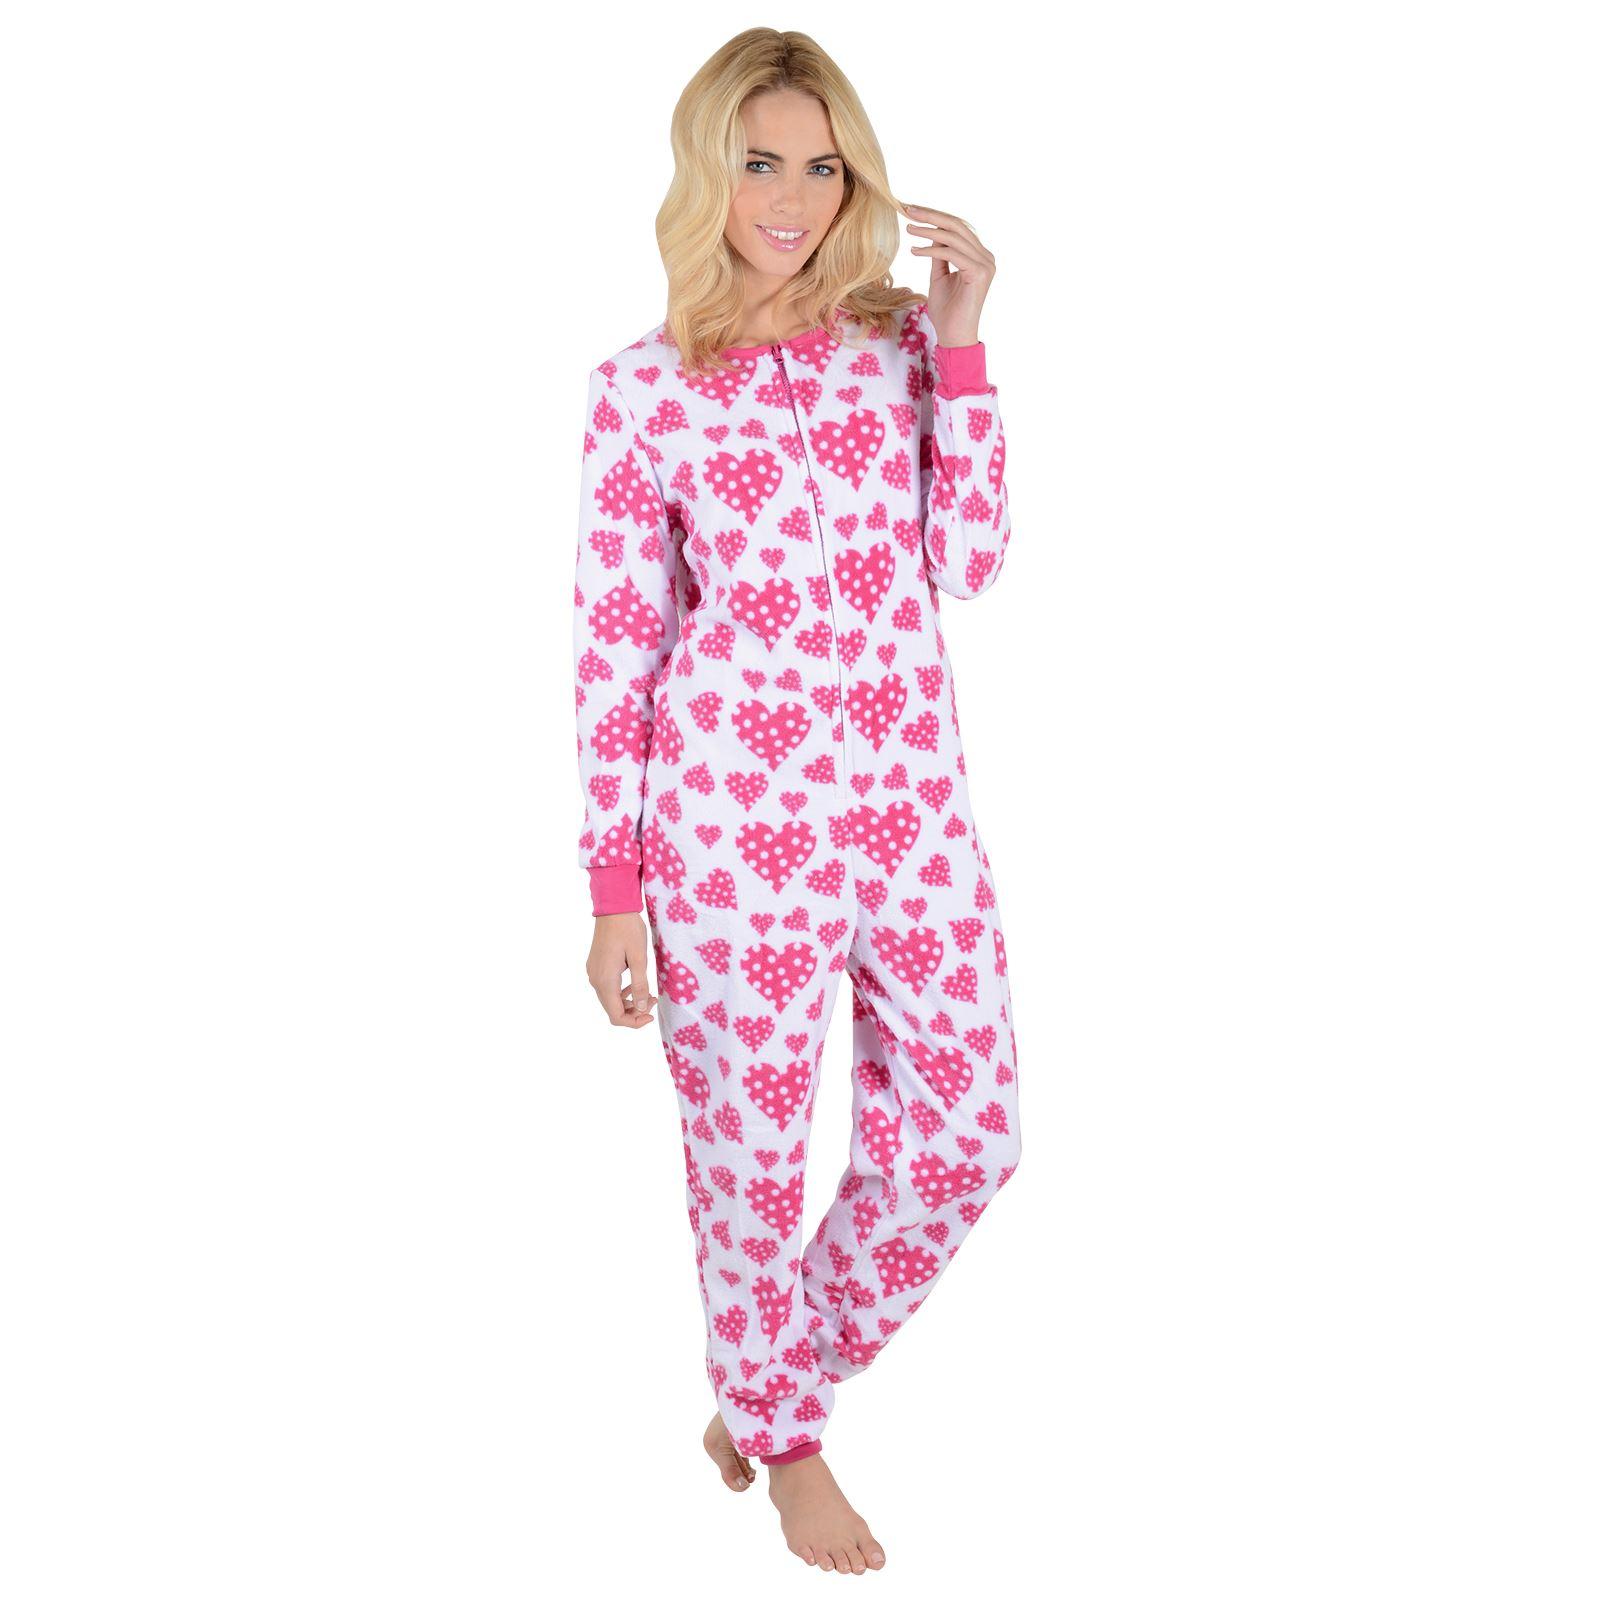 New Ladies Fleece All In One Piece Pyjamas Jump Sleep Suit PJs ... bb79b3595